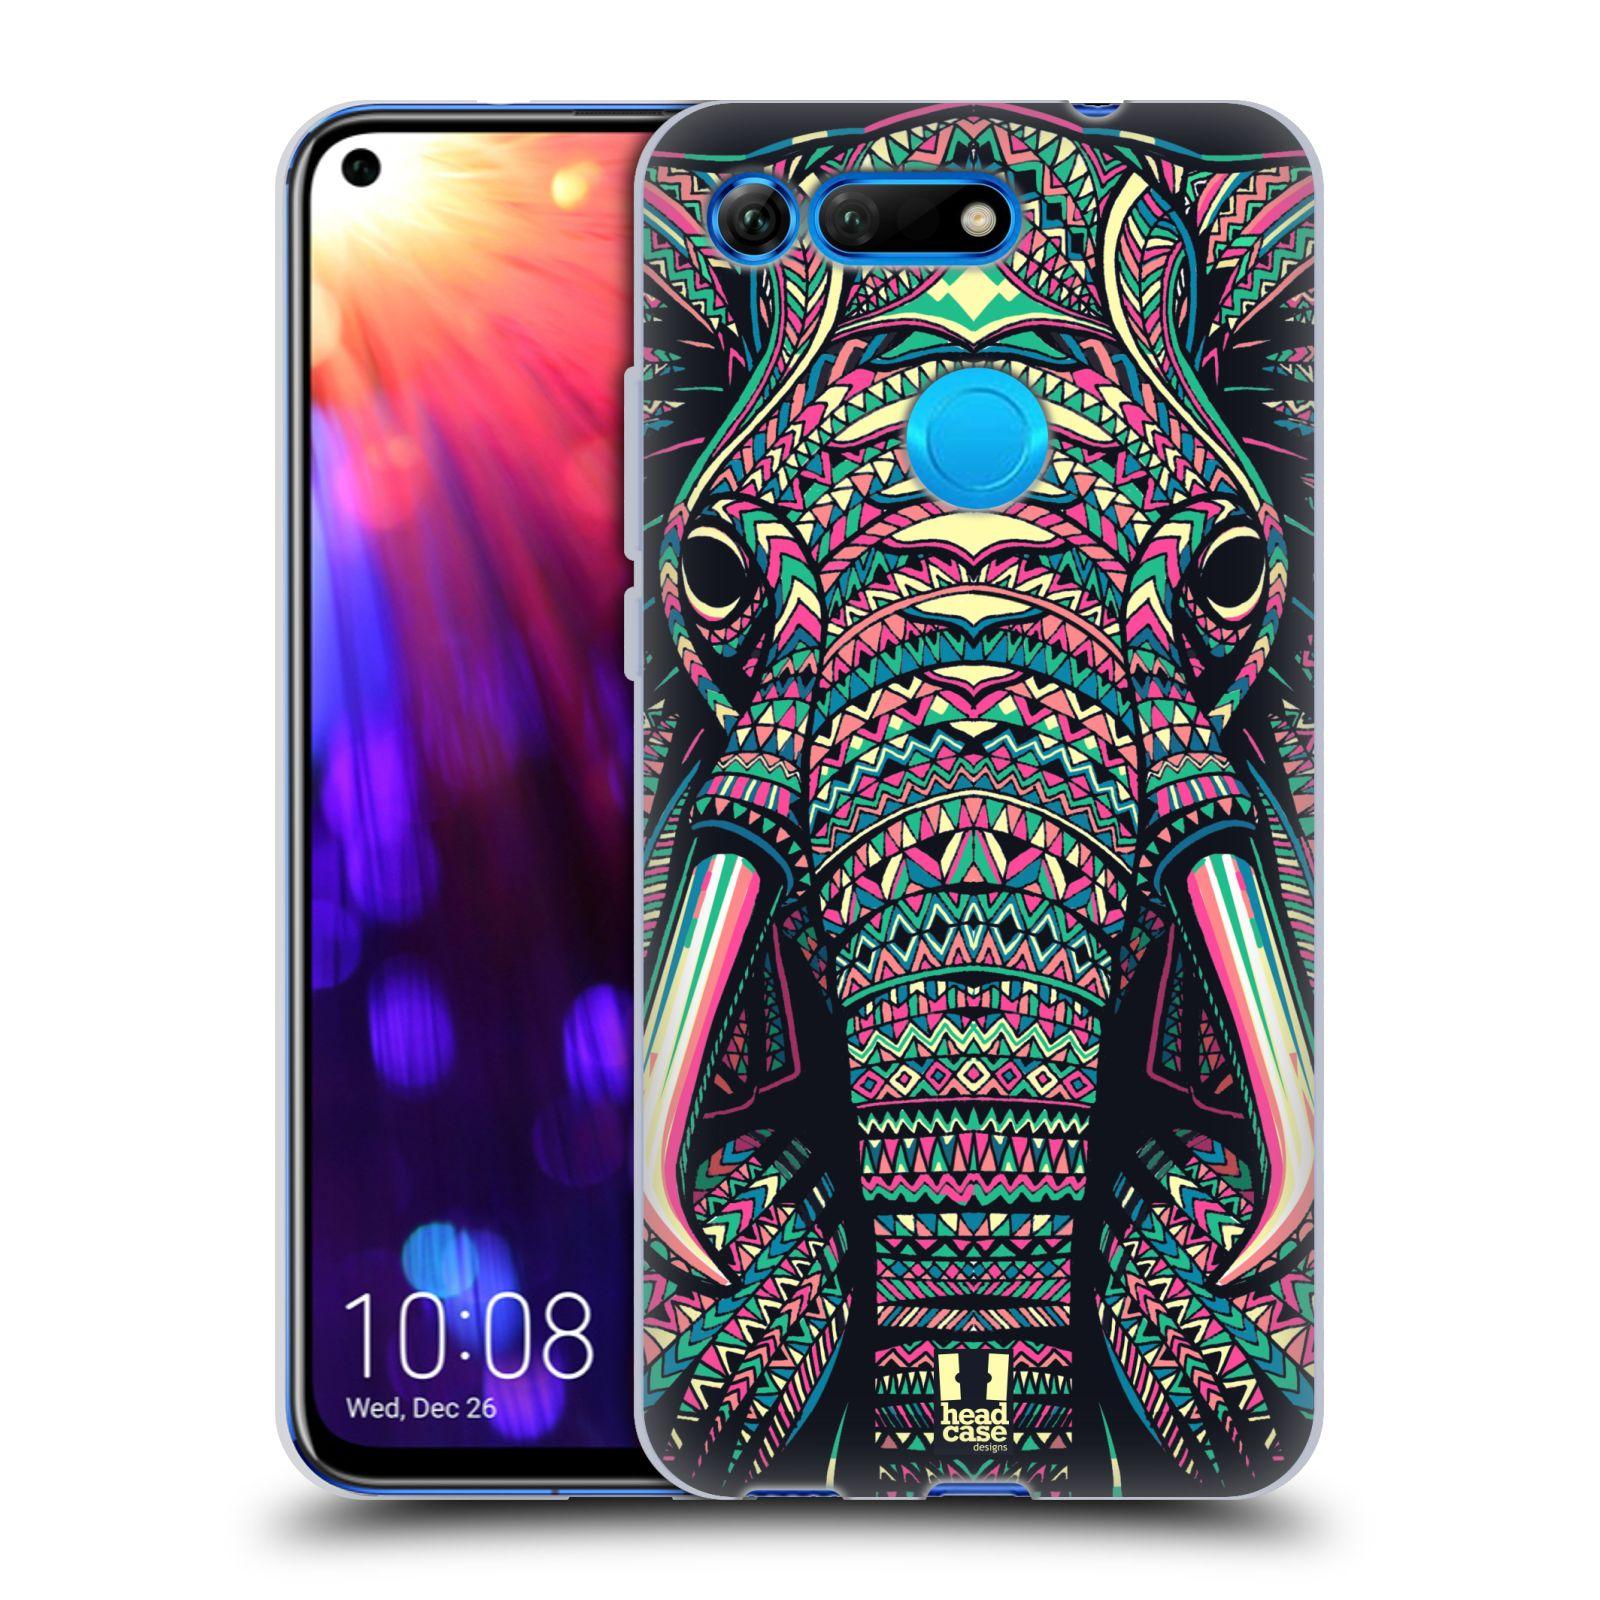 Silikonové pouzdro na mobil Honor View 20 - Head Case - AZTEC SLON